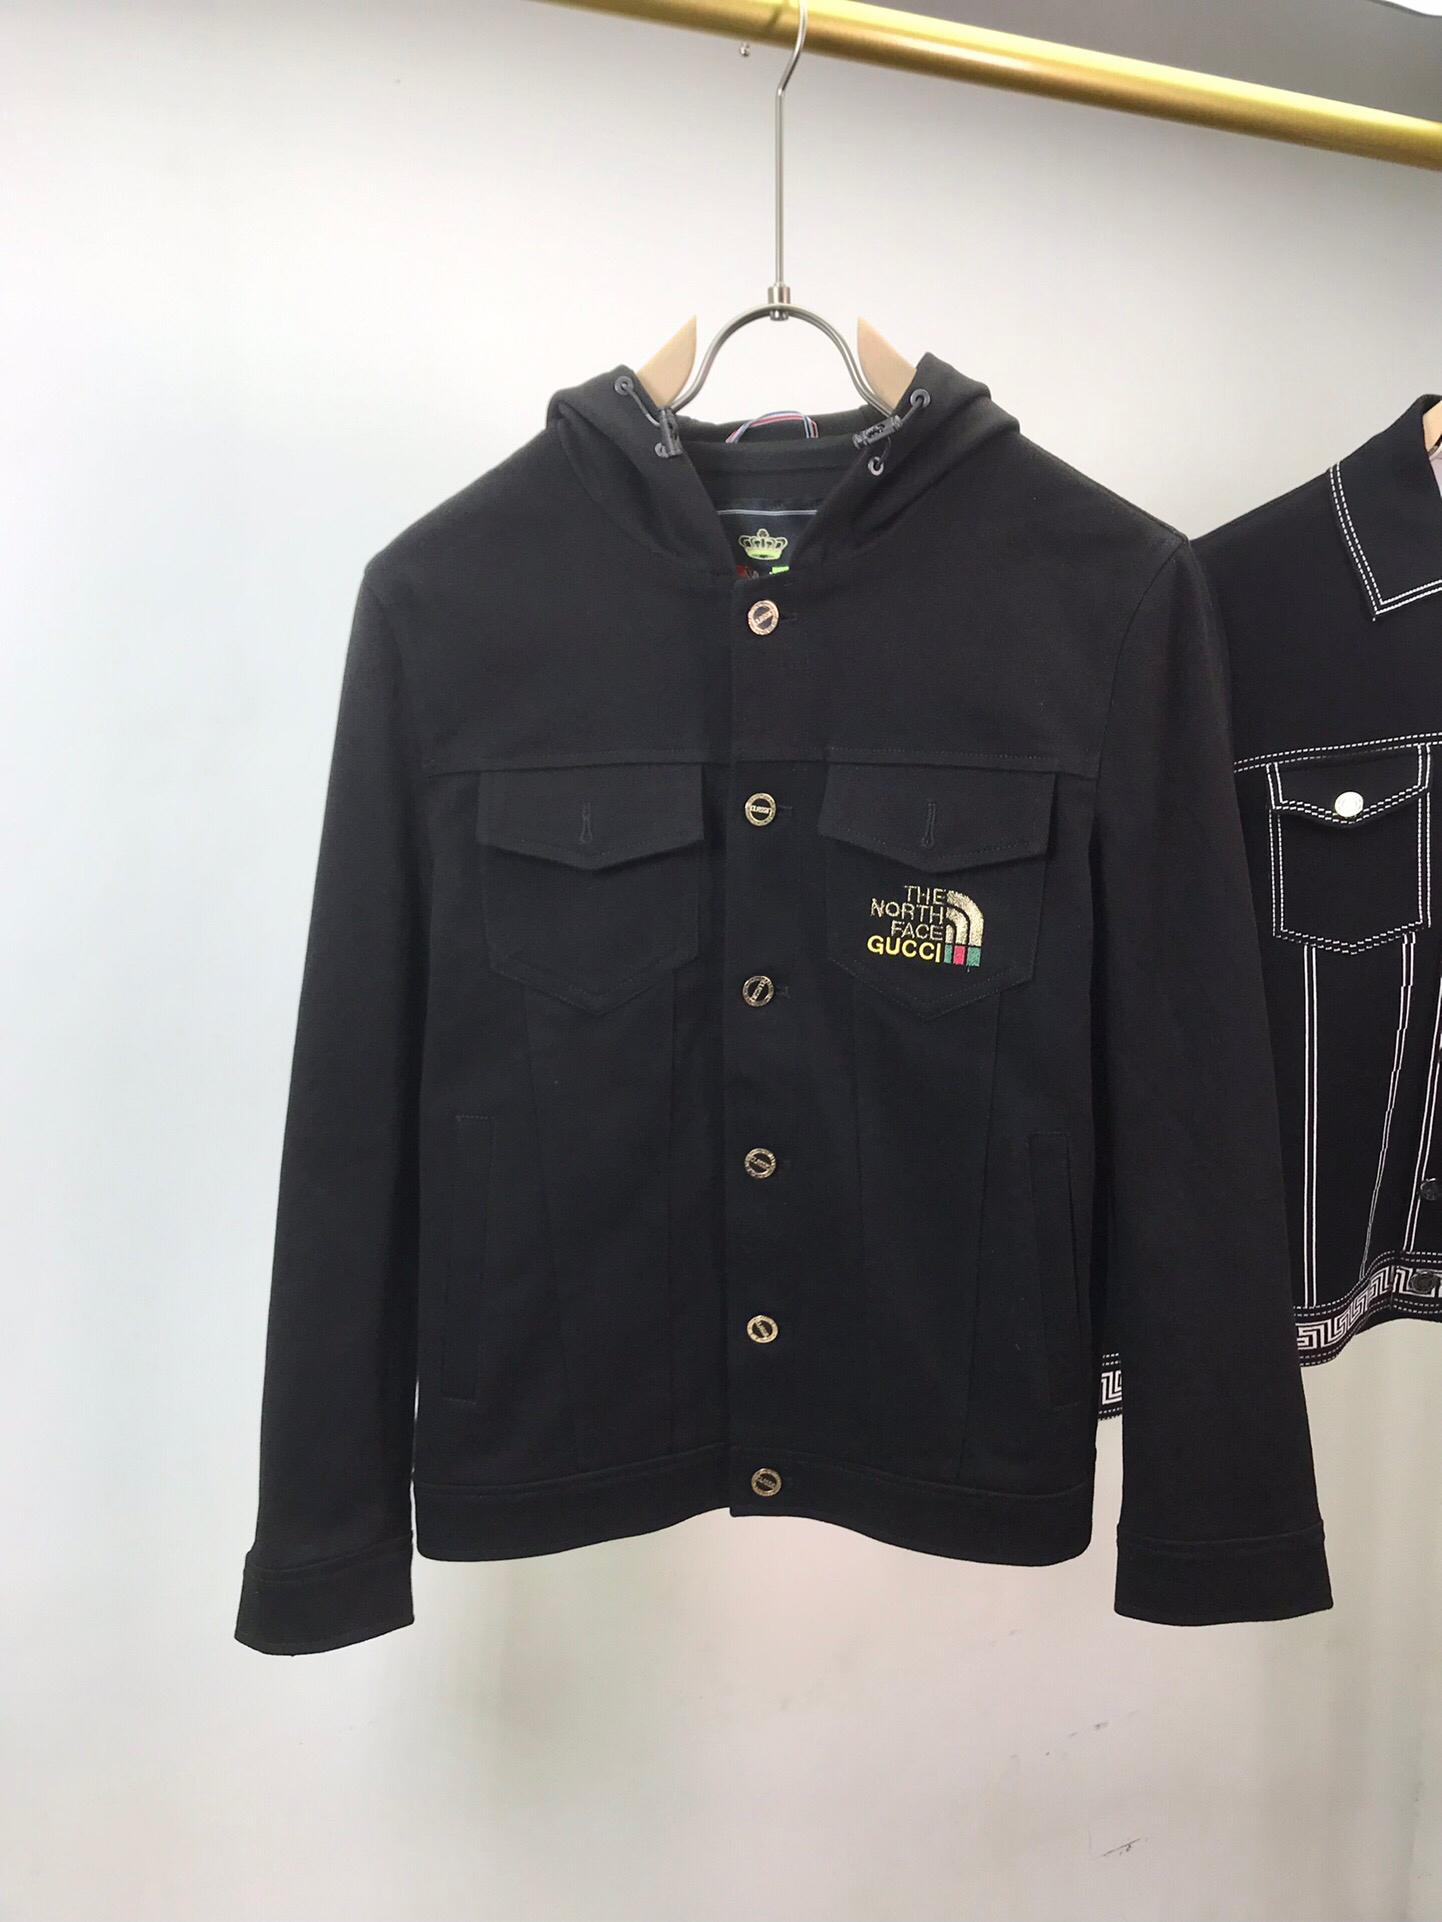 2021ss spring and summer new high grade cotton shirt Men's hoodie Suit pants Casual Fashion jacket Color stripe print sweatshirt Size: s-xxxl Color: black white 486